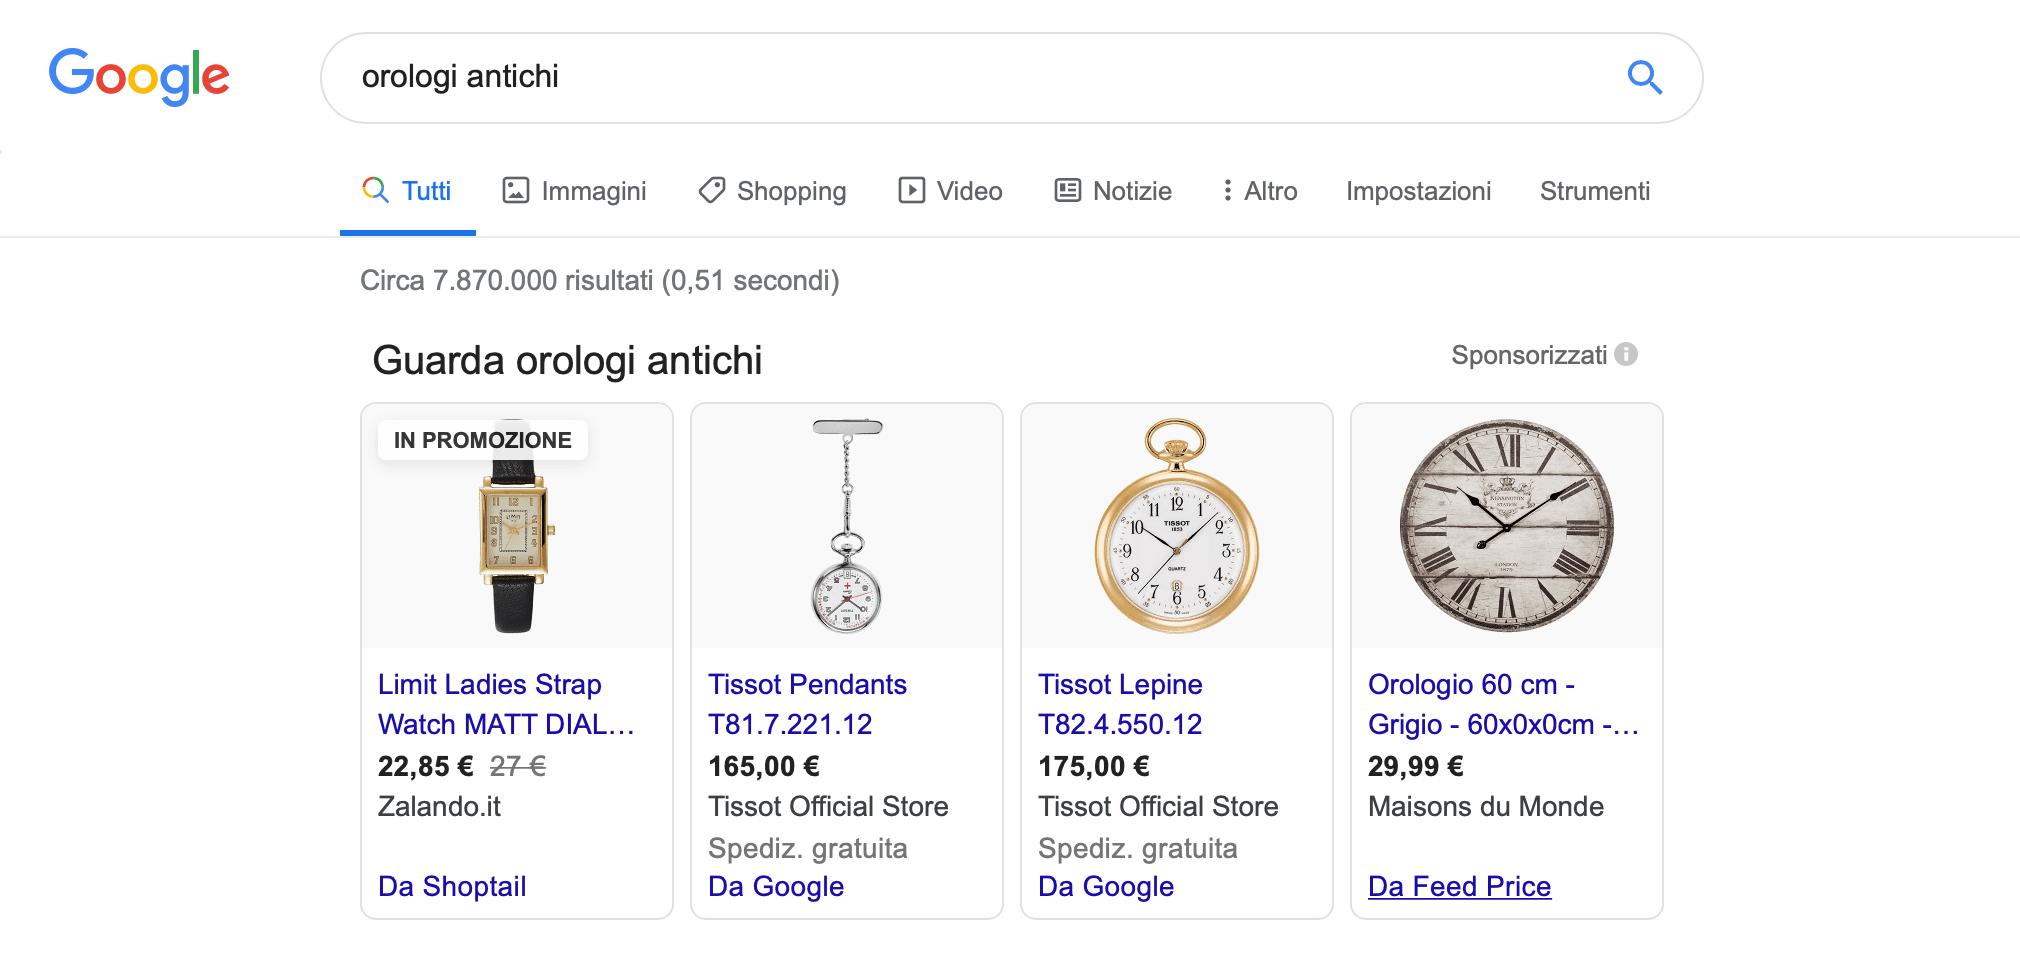 google my business orologi